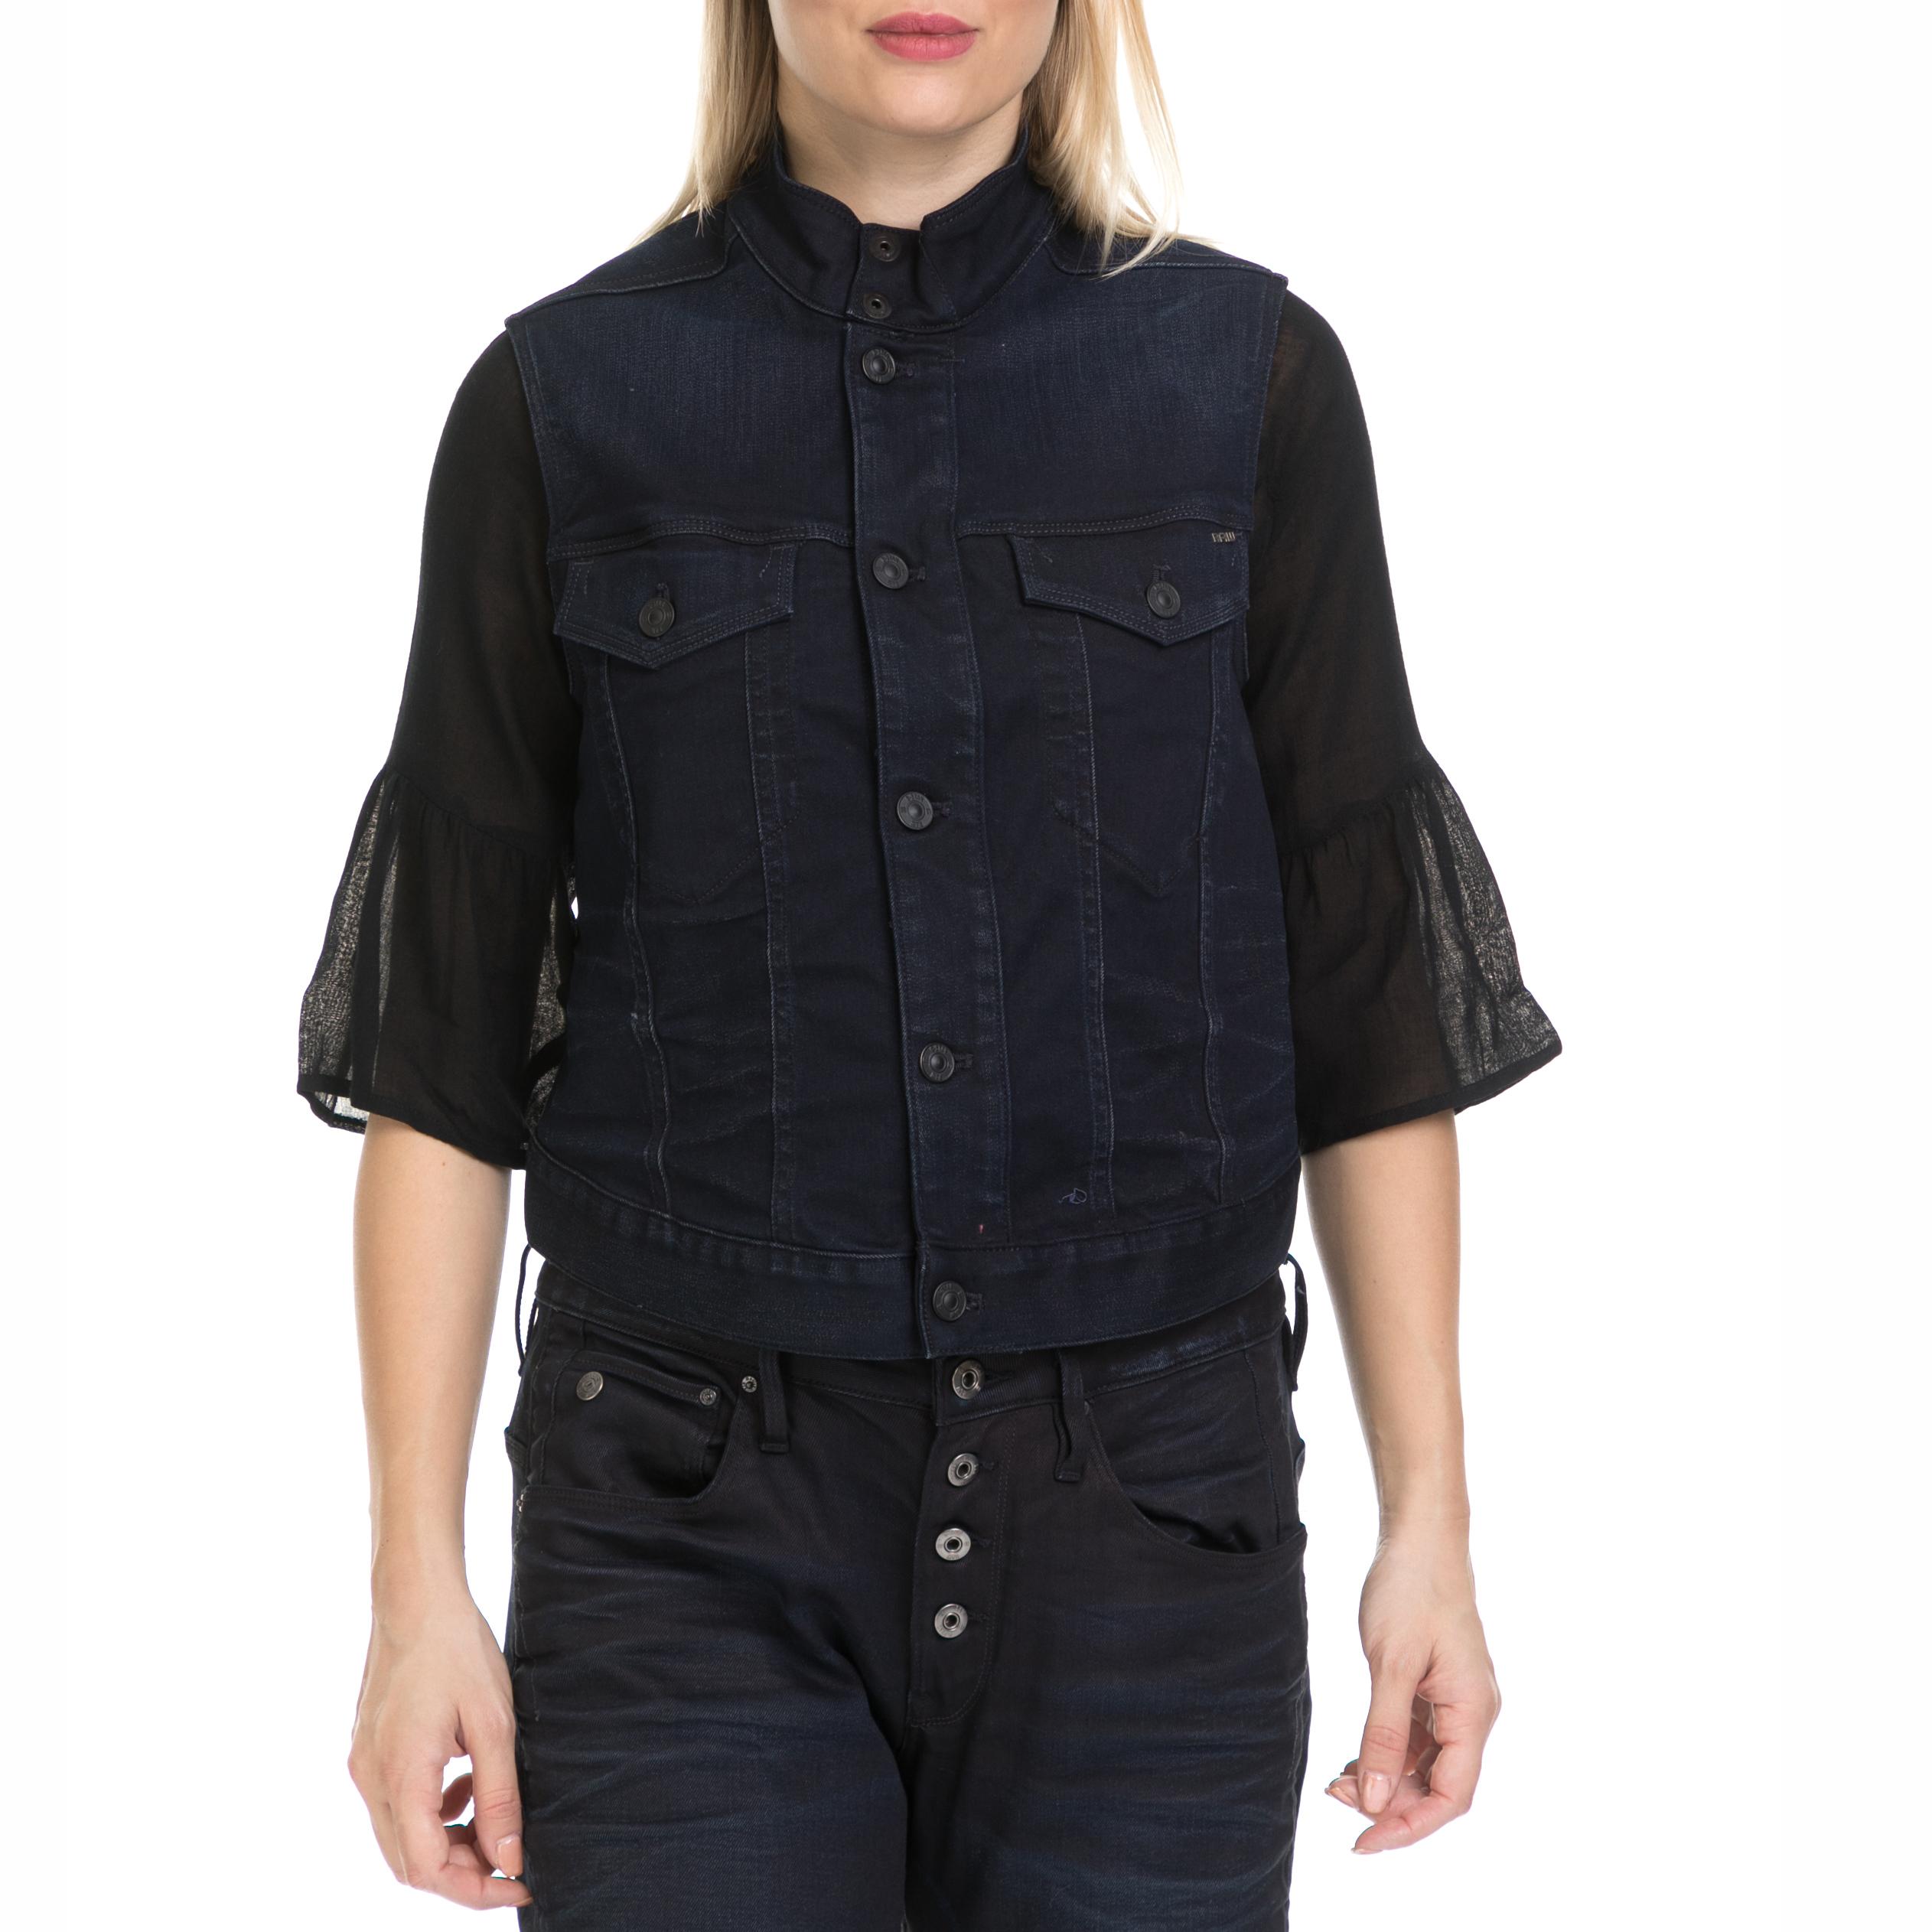 G-STAR - Γυναικείο τζιν μπουφάν G-STAR μπλε γυναικεία ρούχα πανωφόρια αμάνικα μπουφάν